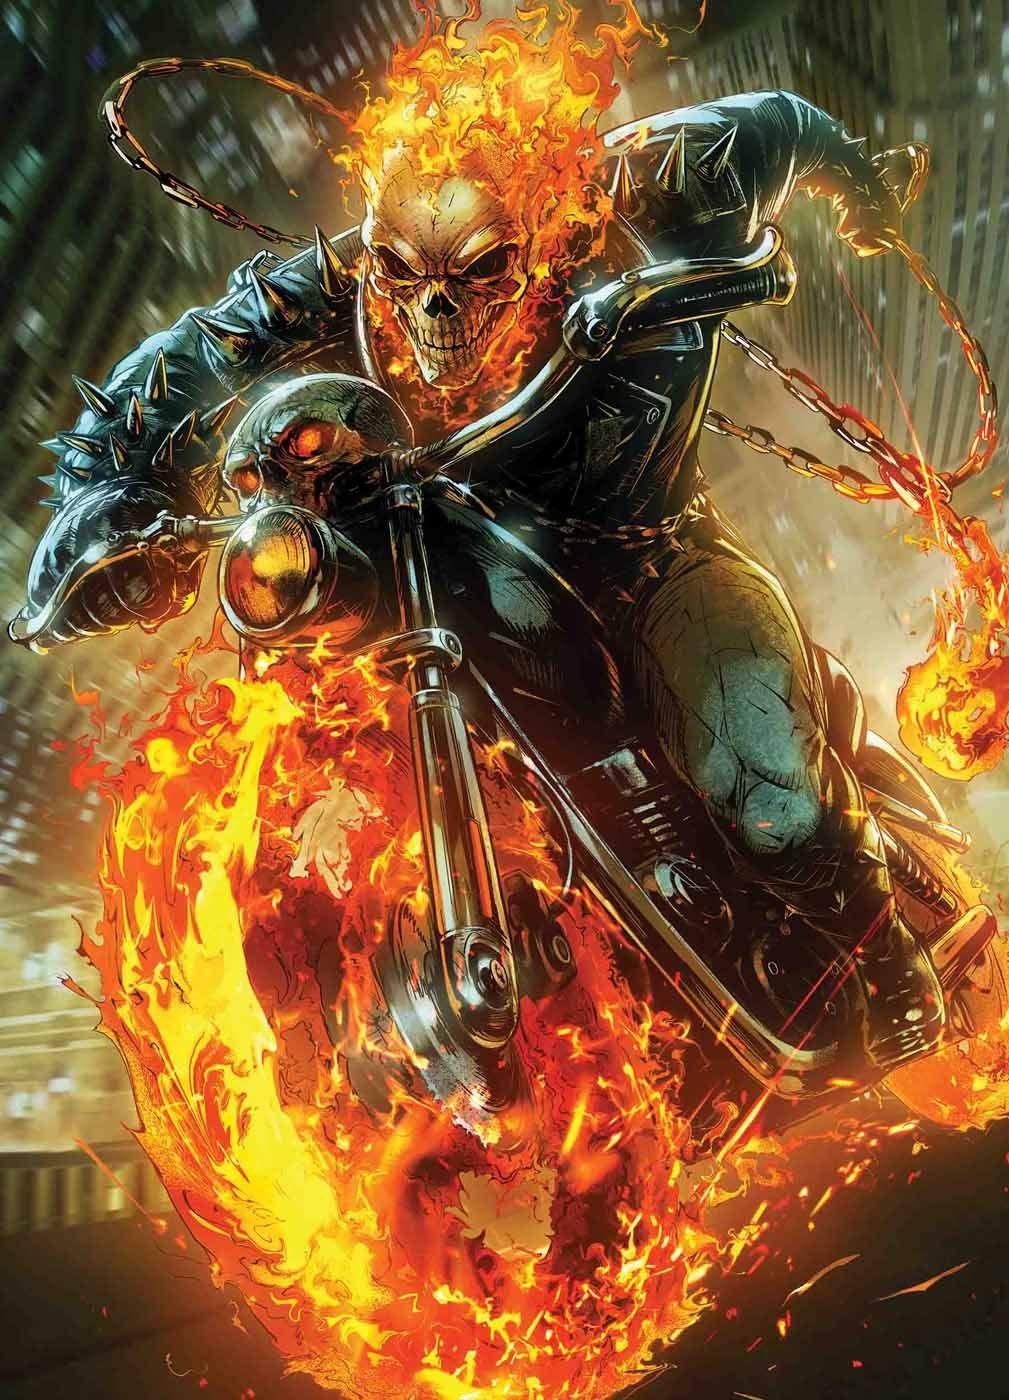 Cosmic Ghost Rider 4 Ghost Rider Wallpaper Ghost Rider Marvel Ghost Rider Johnny Blaze Iphone iphone 6 ghost rider wallpaper